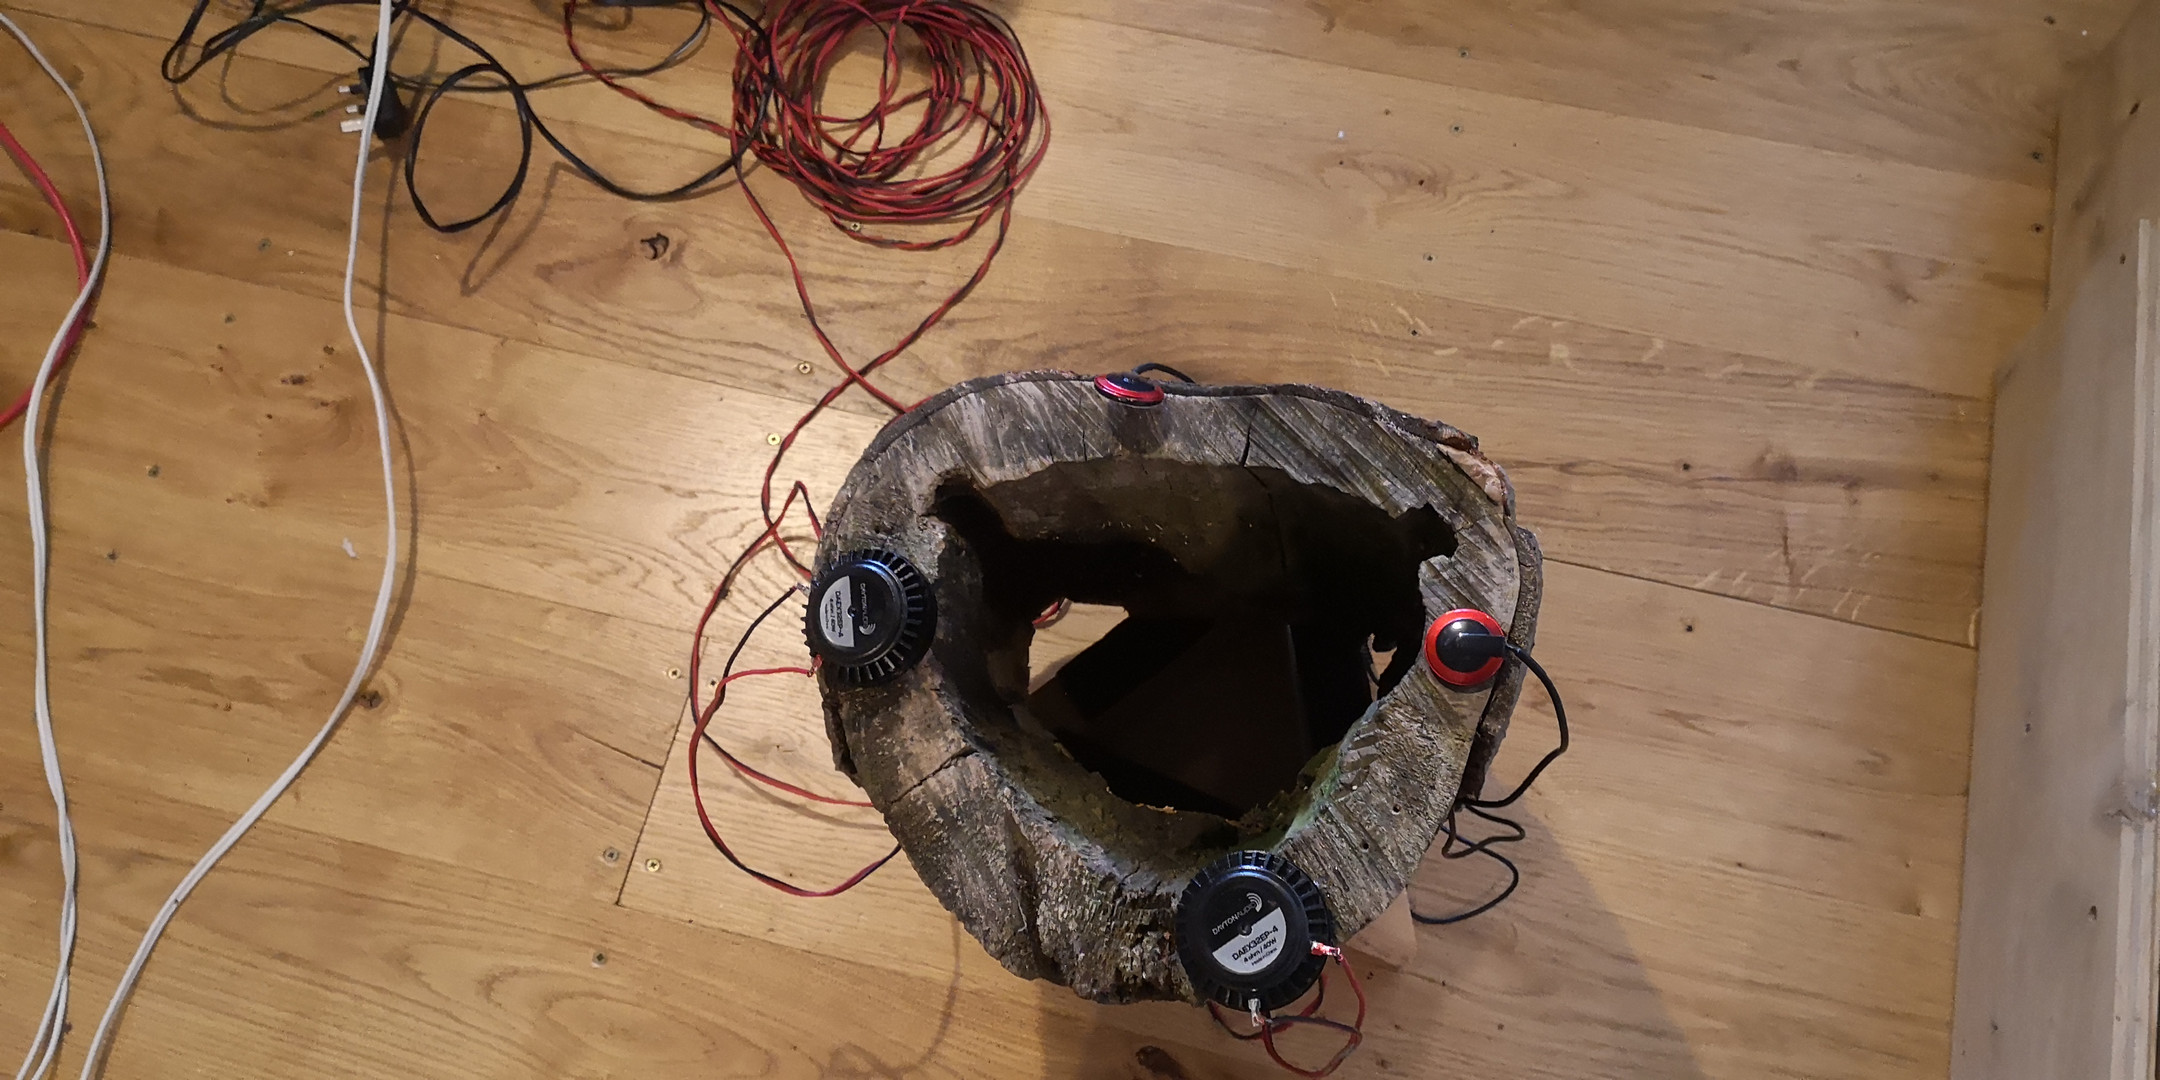 Hollow log receiving sound from orb via transducers. Sending sound via contact microphones.